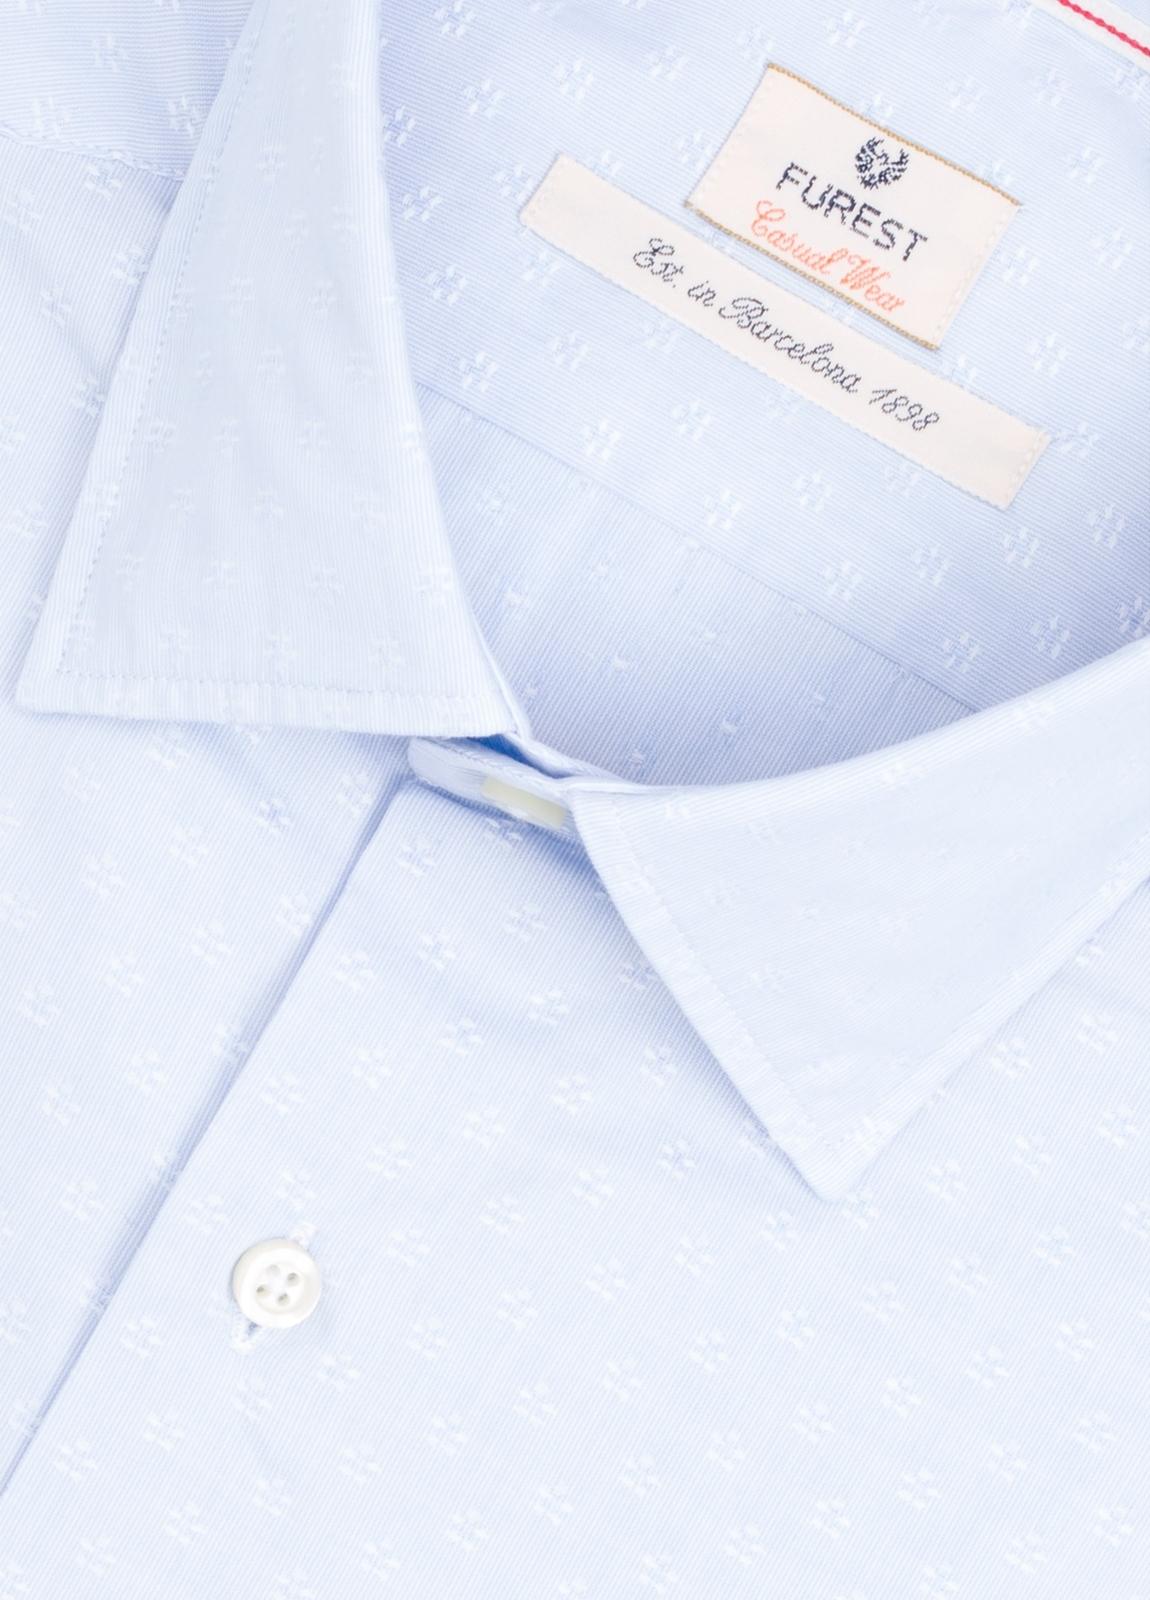 Camisa Casual Wear SLIM FIT Modelo PORTO micrograbado color celeste.100% Algodón. - Ítem1